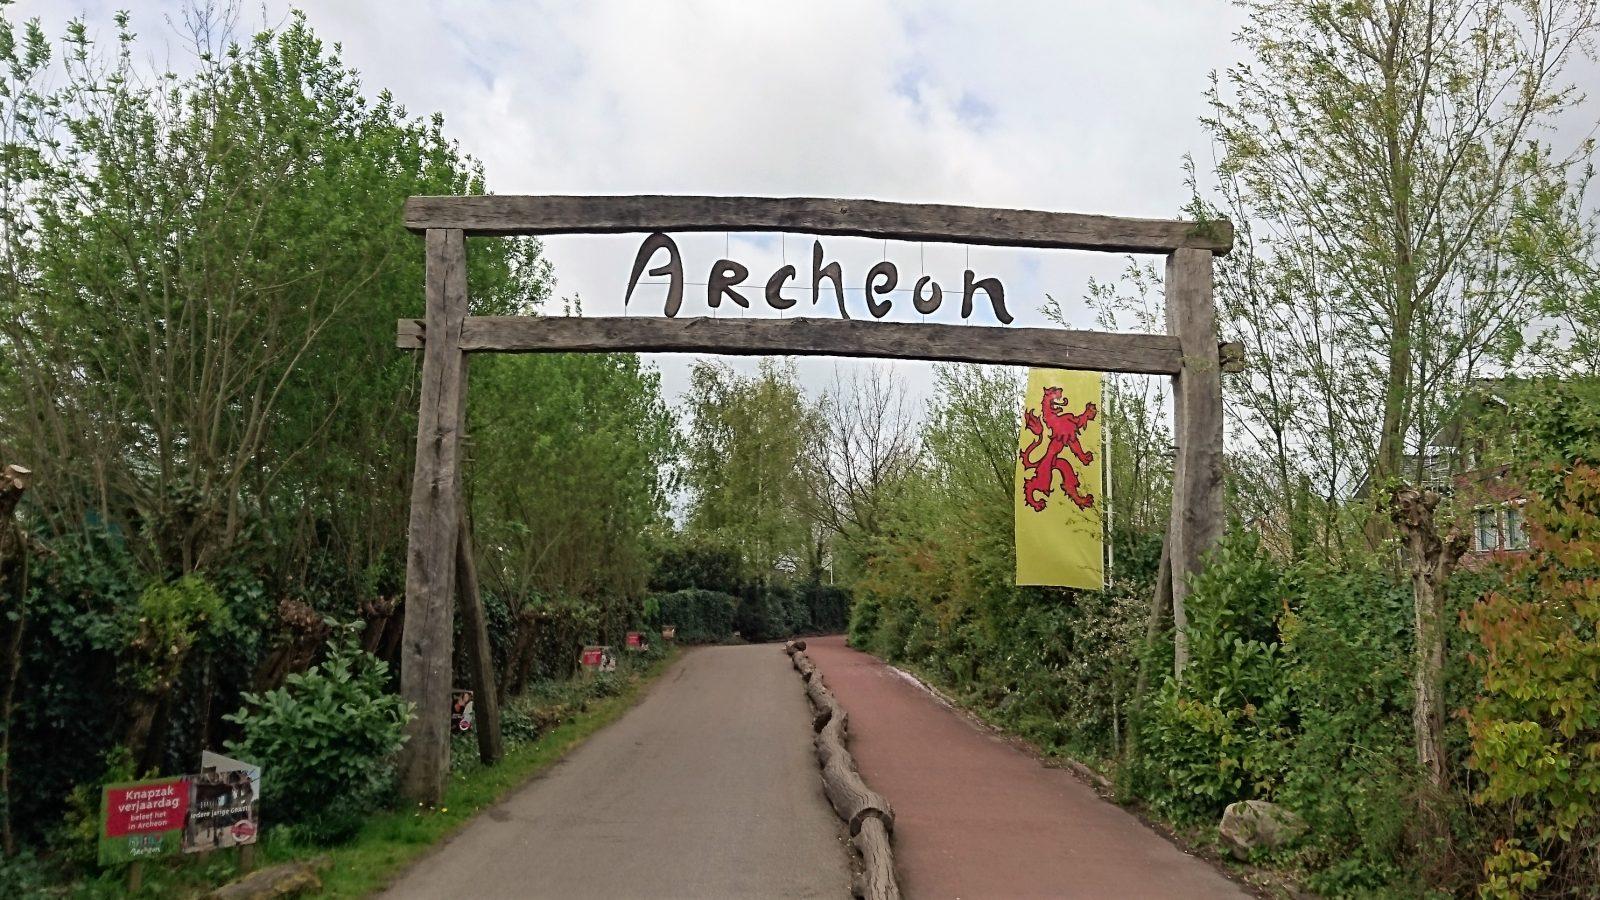 Archeon toegangspoort